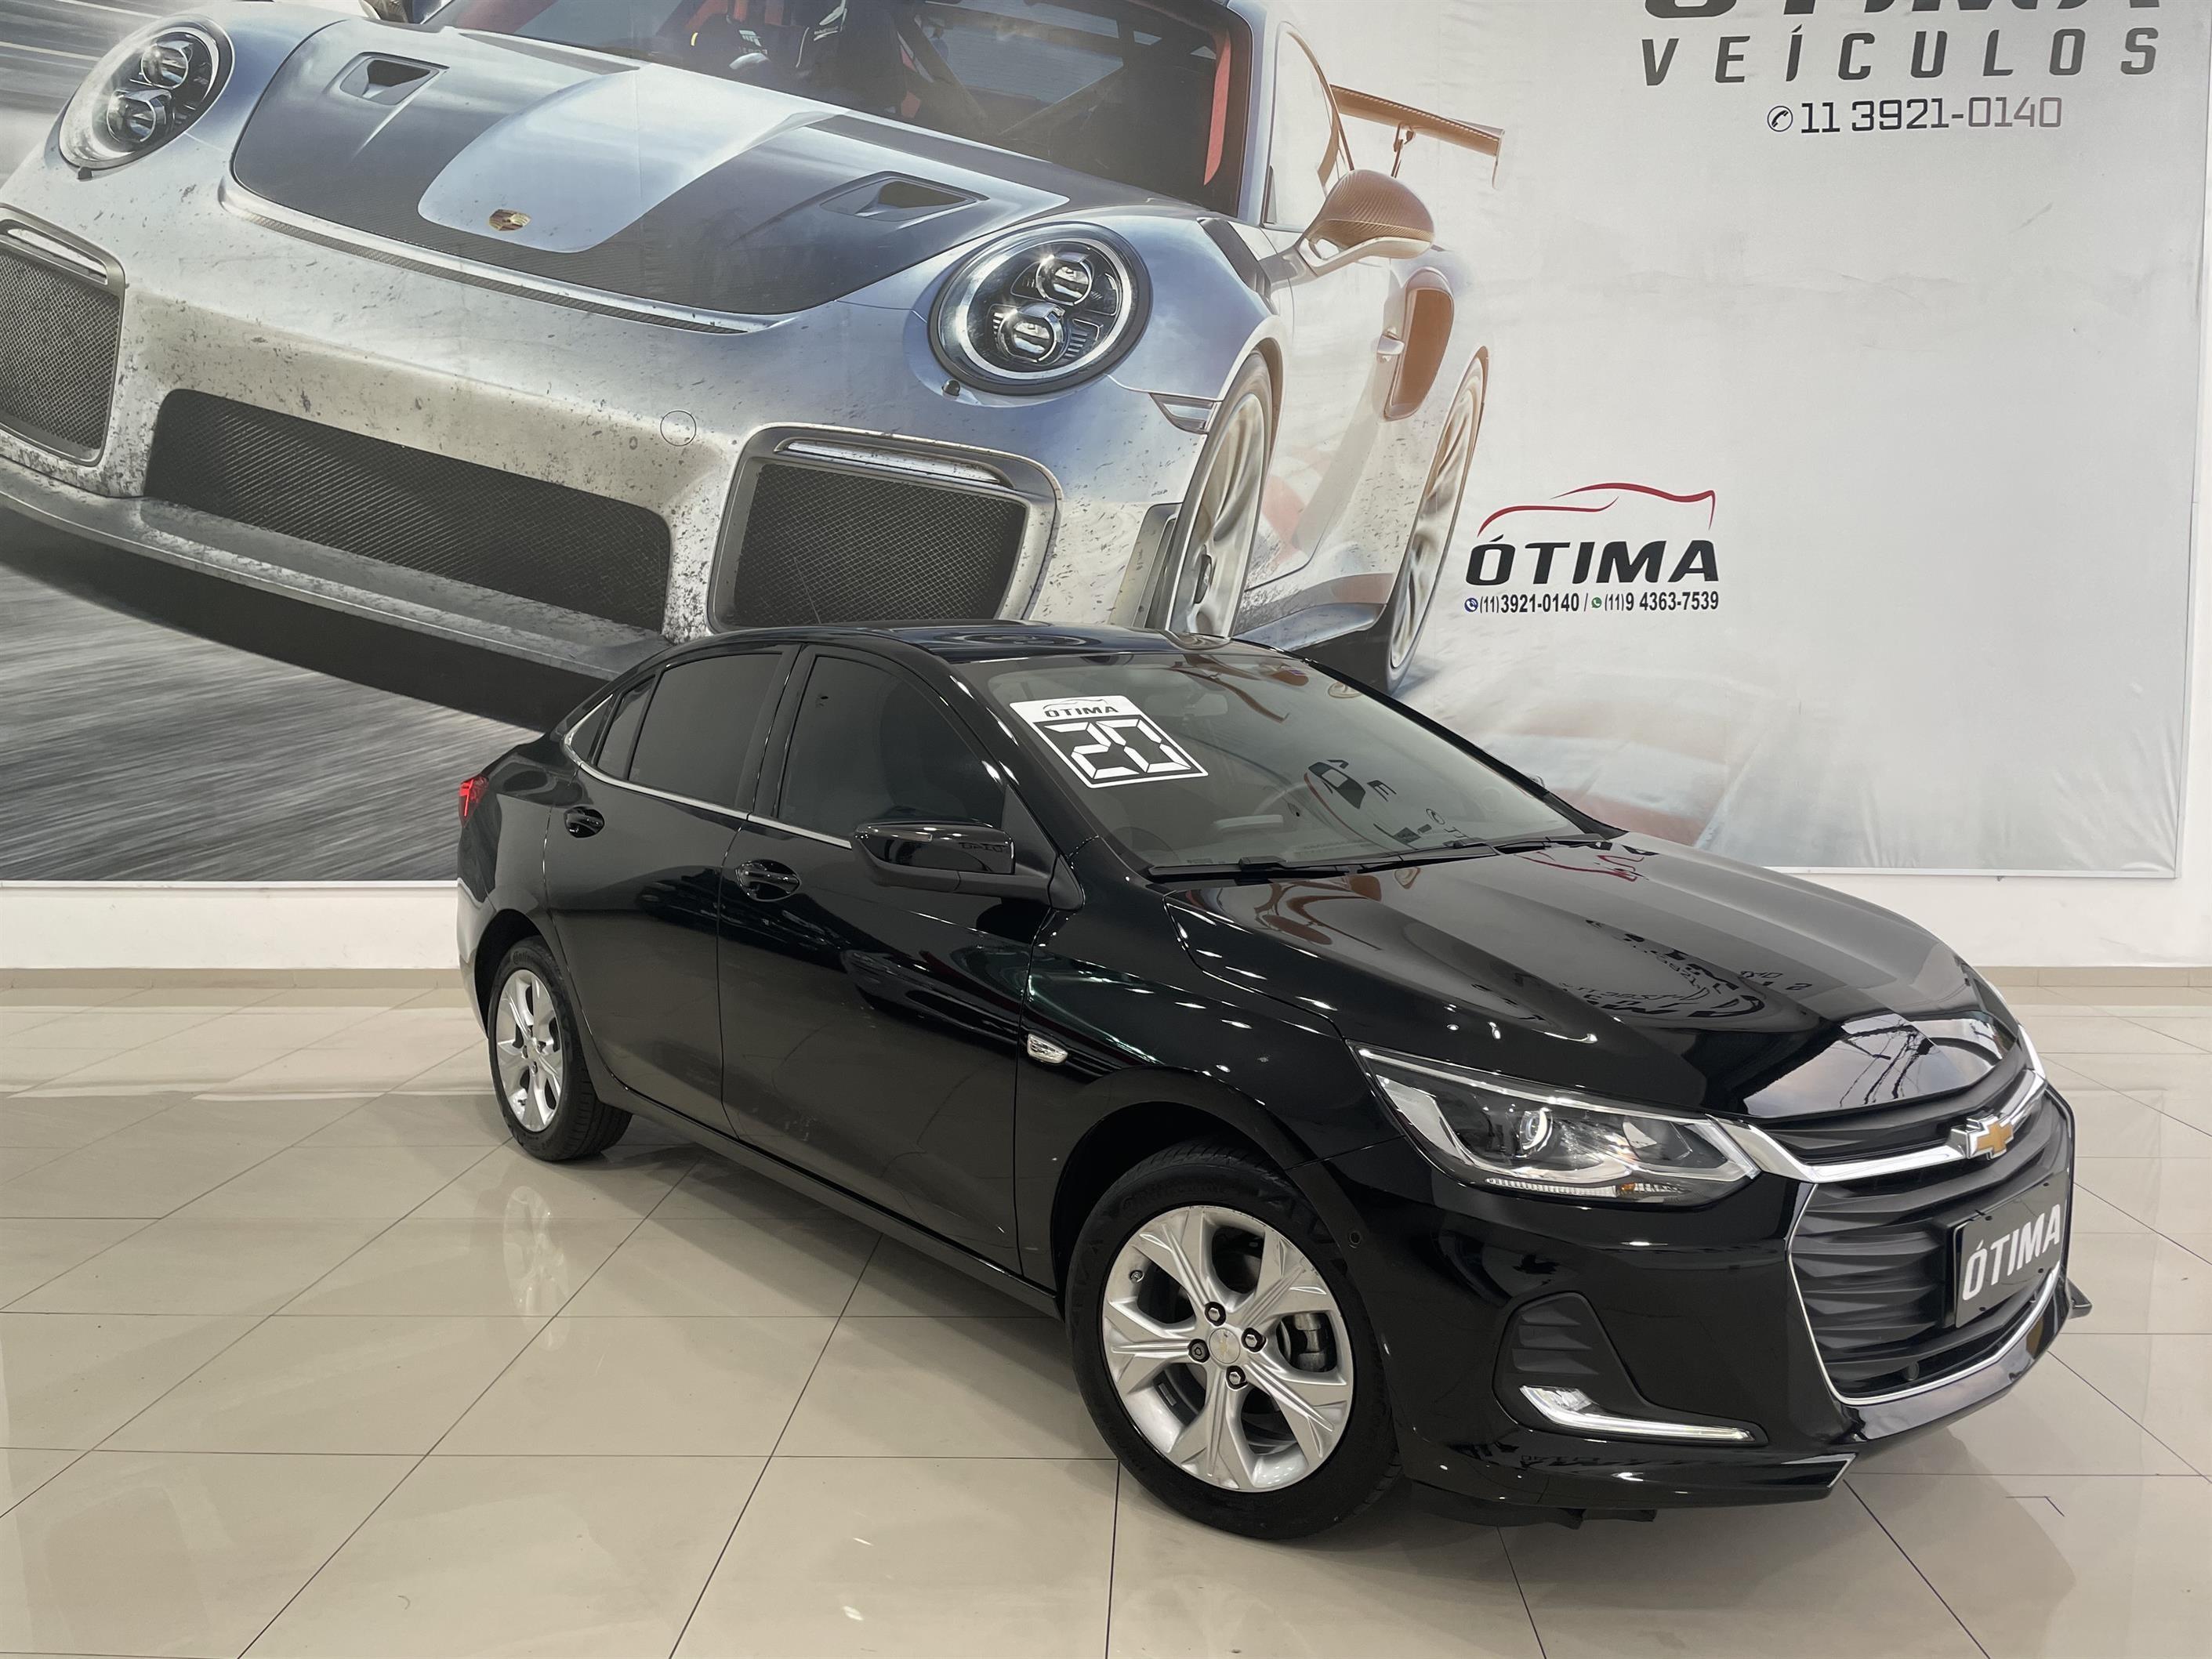 //www.autoline.com.br/carro/chevrolet/onix-10-turbo-premier-12v-flex-4p-automatico/2020/sao-paulo-sp/15700020